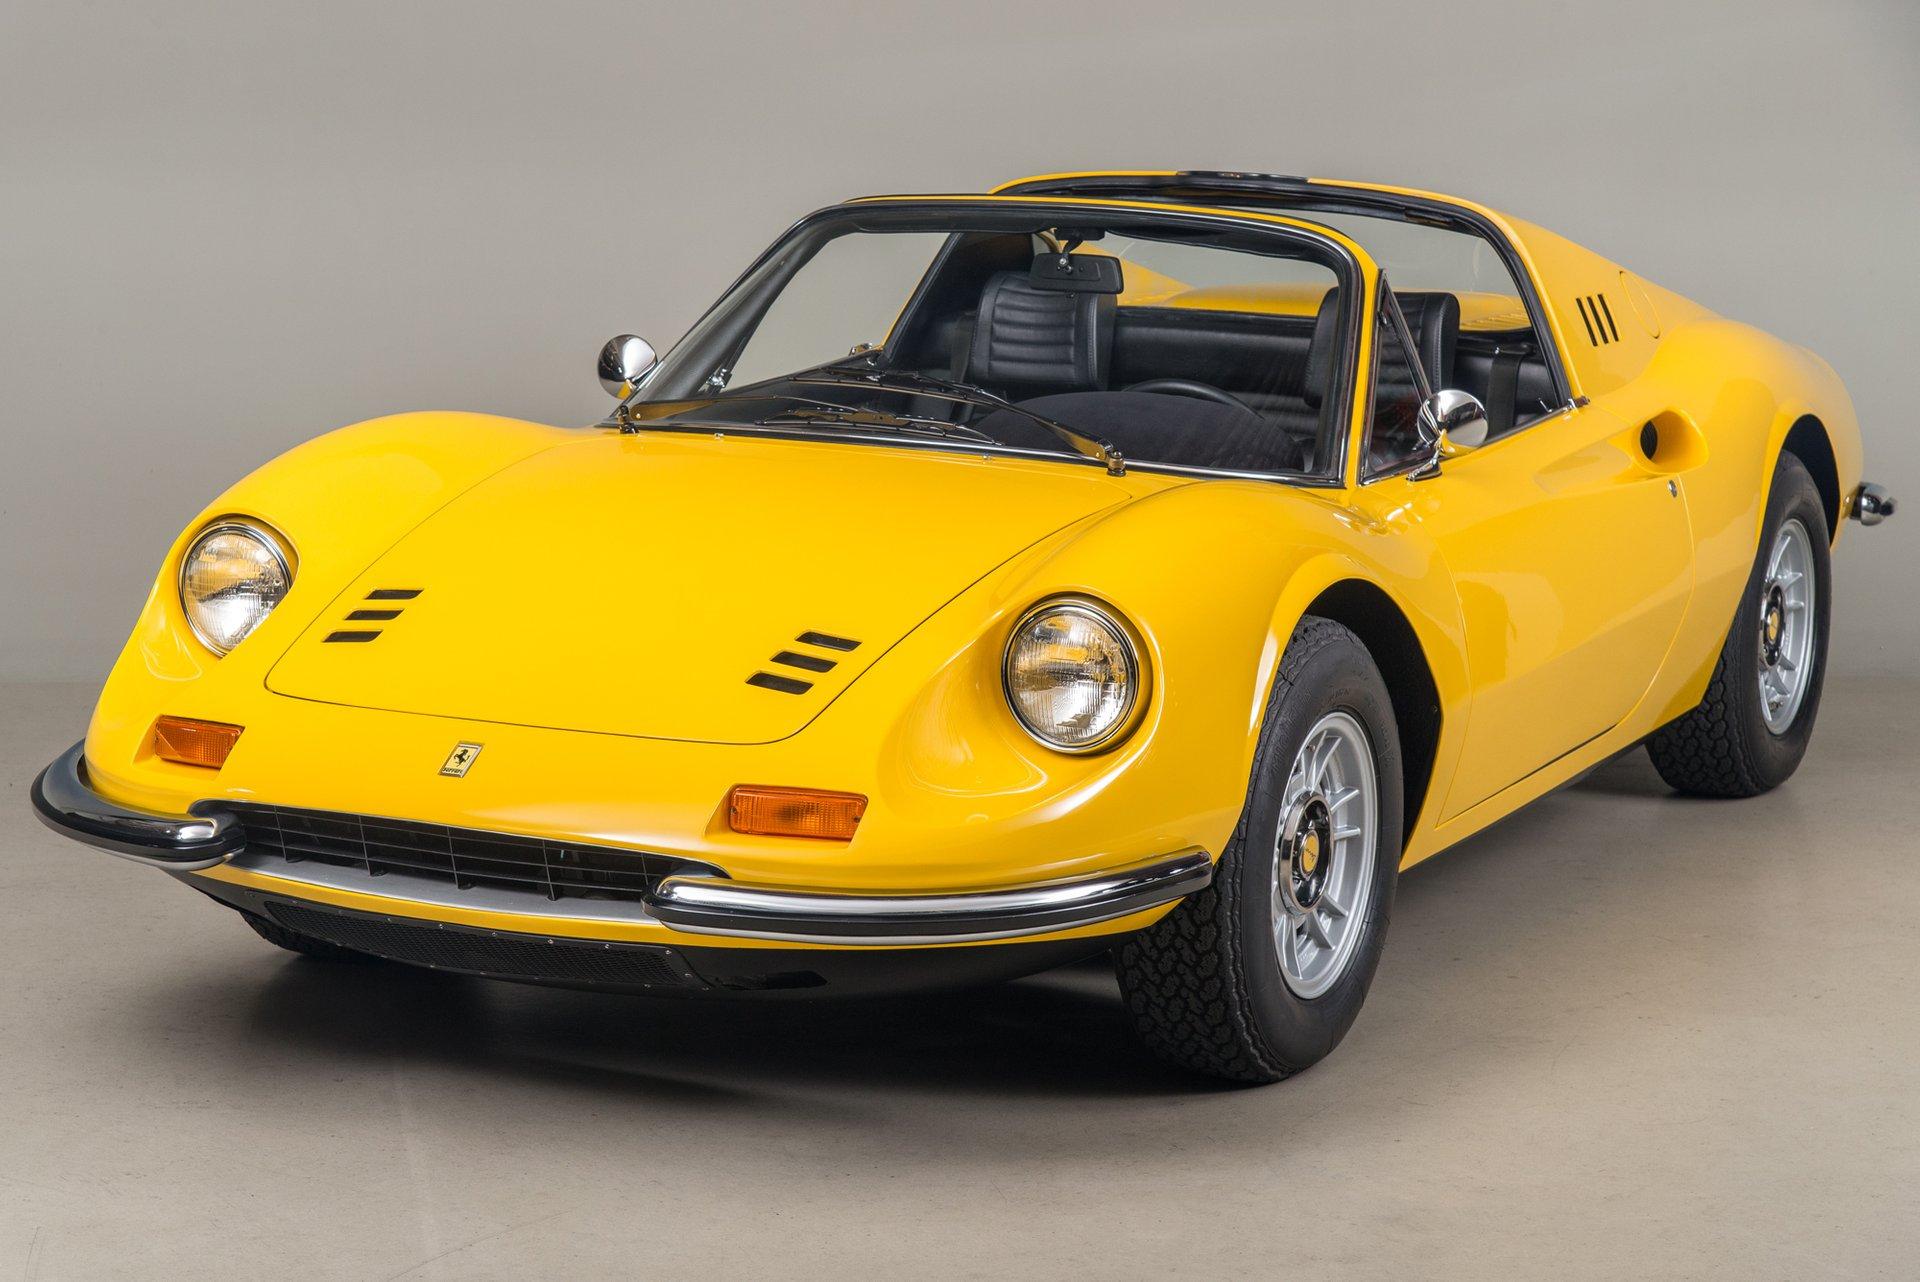 1972 Ferrari Dino 246 Gts For Sale 108013 Mcg